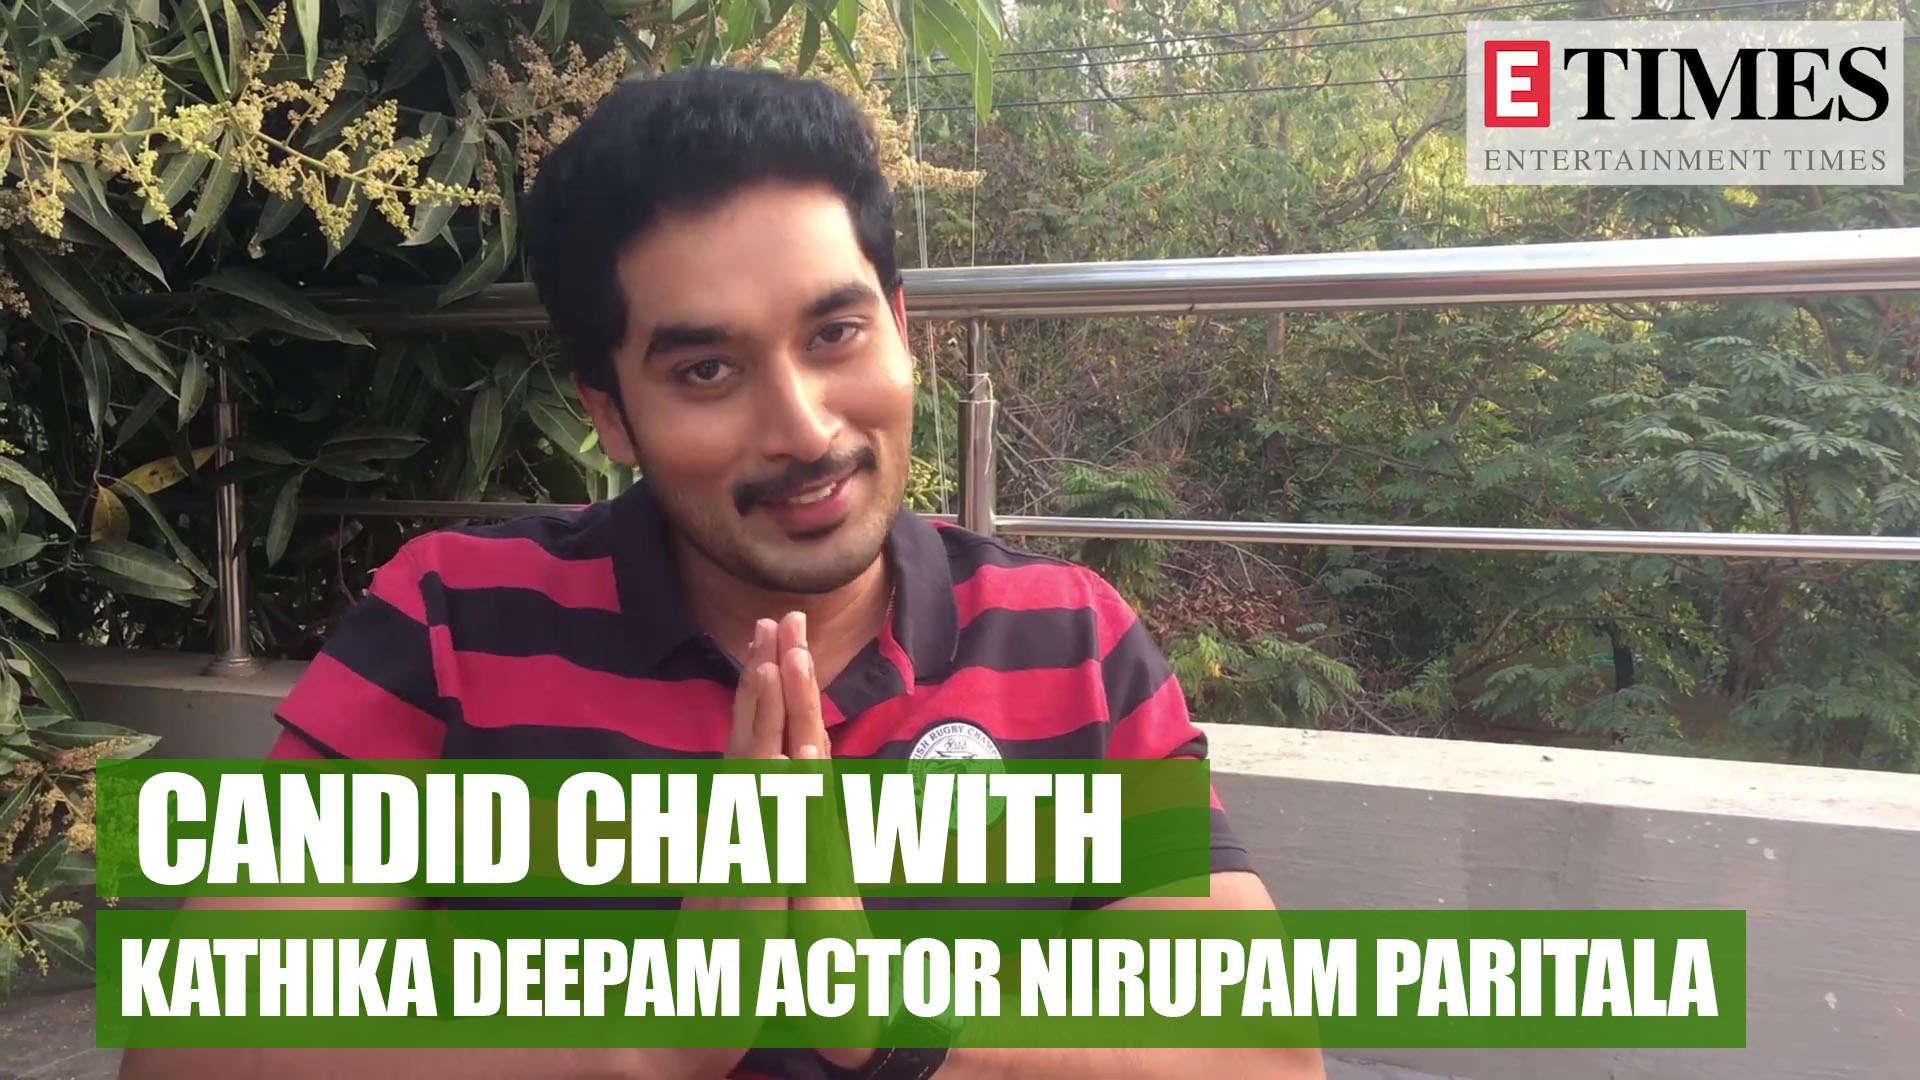 Actor Nirupam Paritala on Karthika Deepam, his co-stars and much more